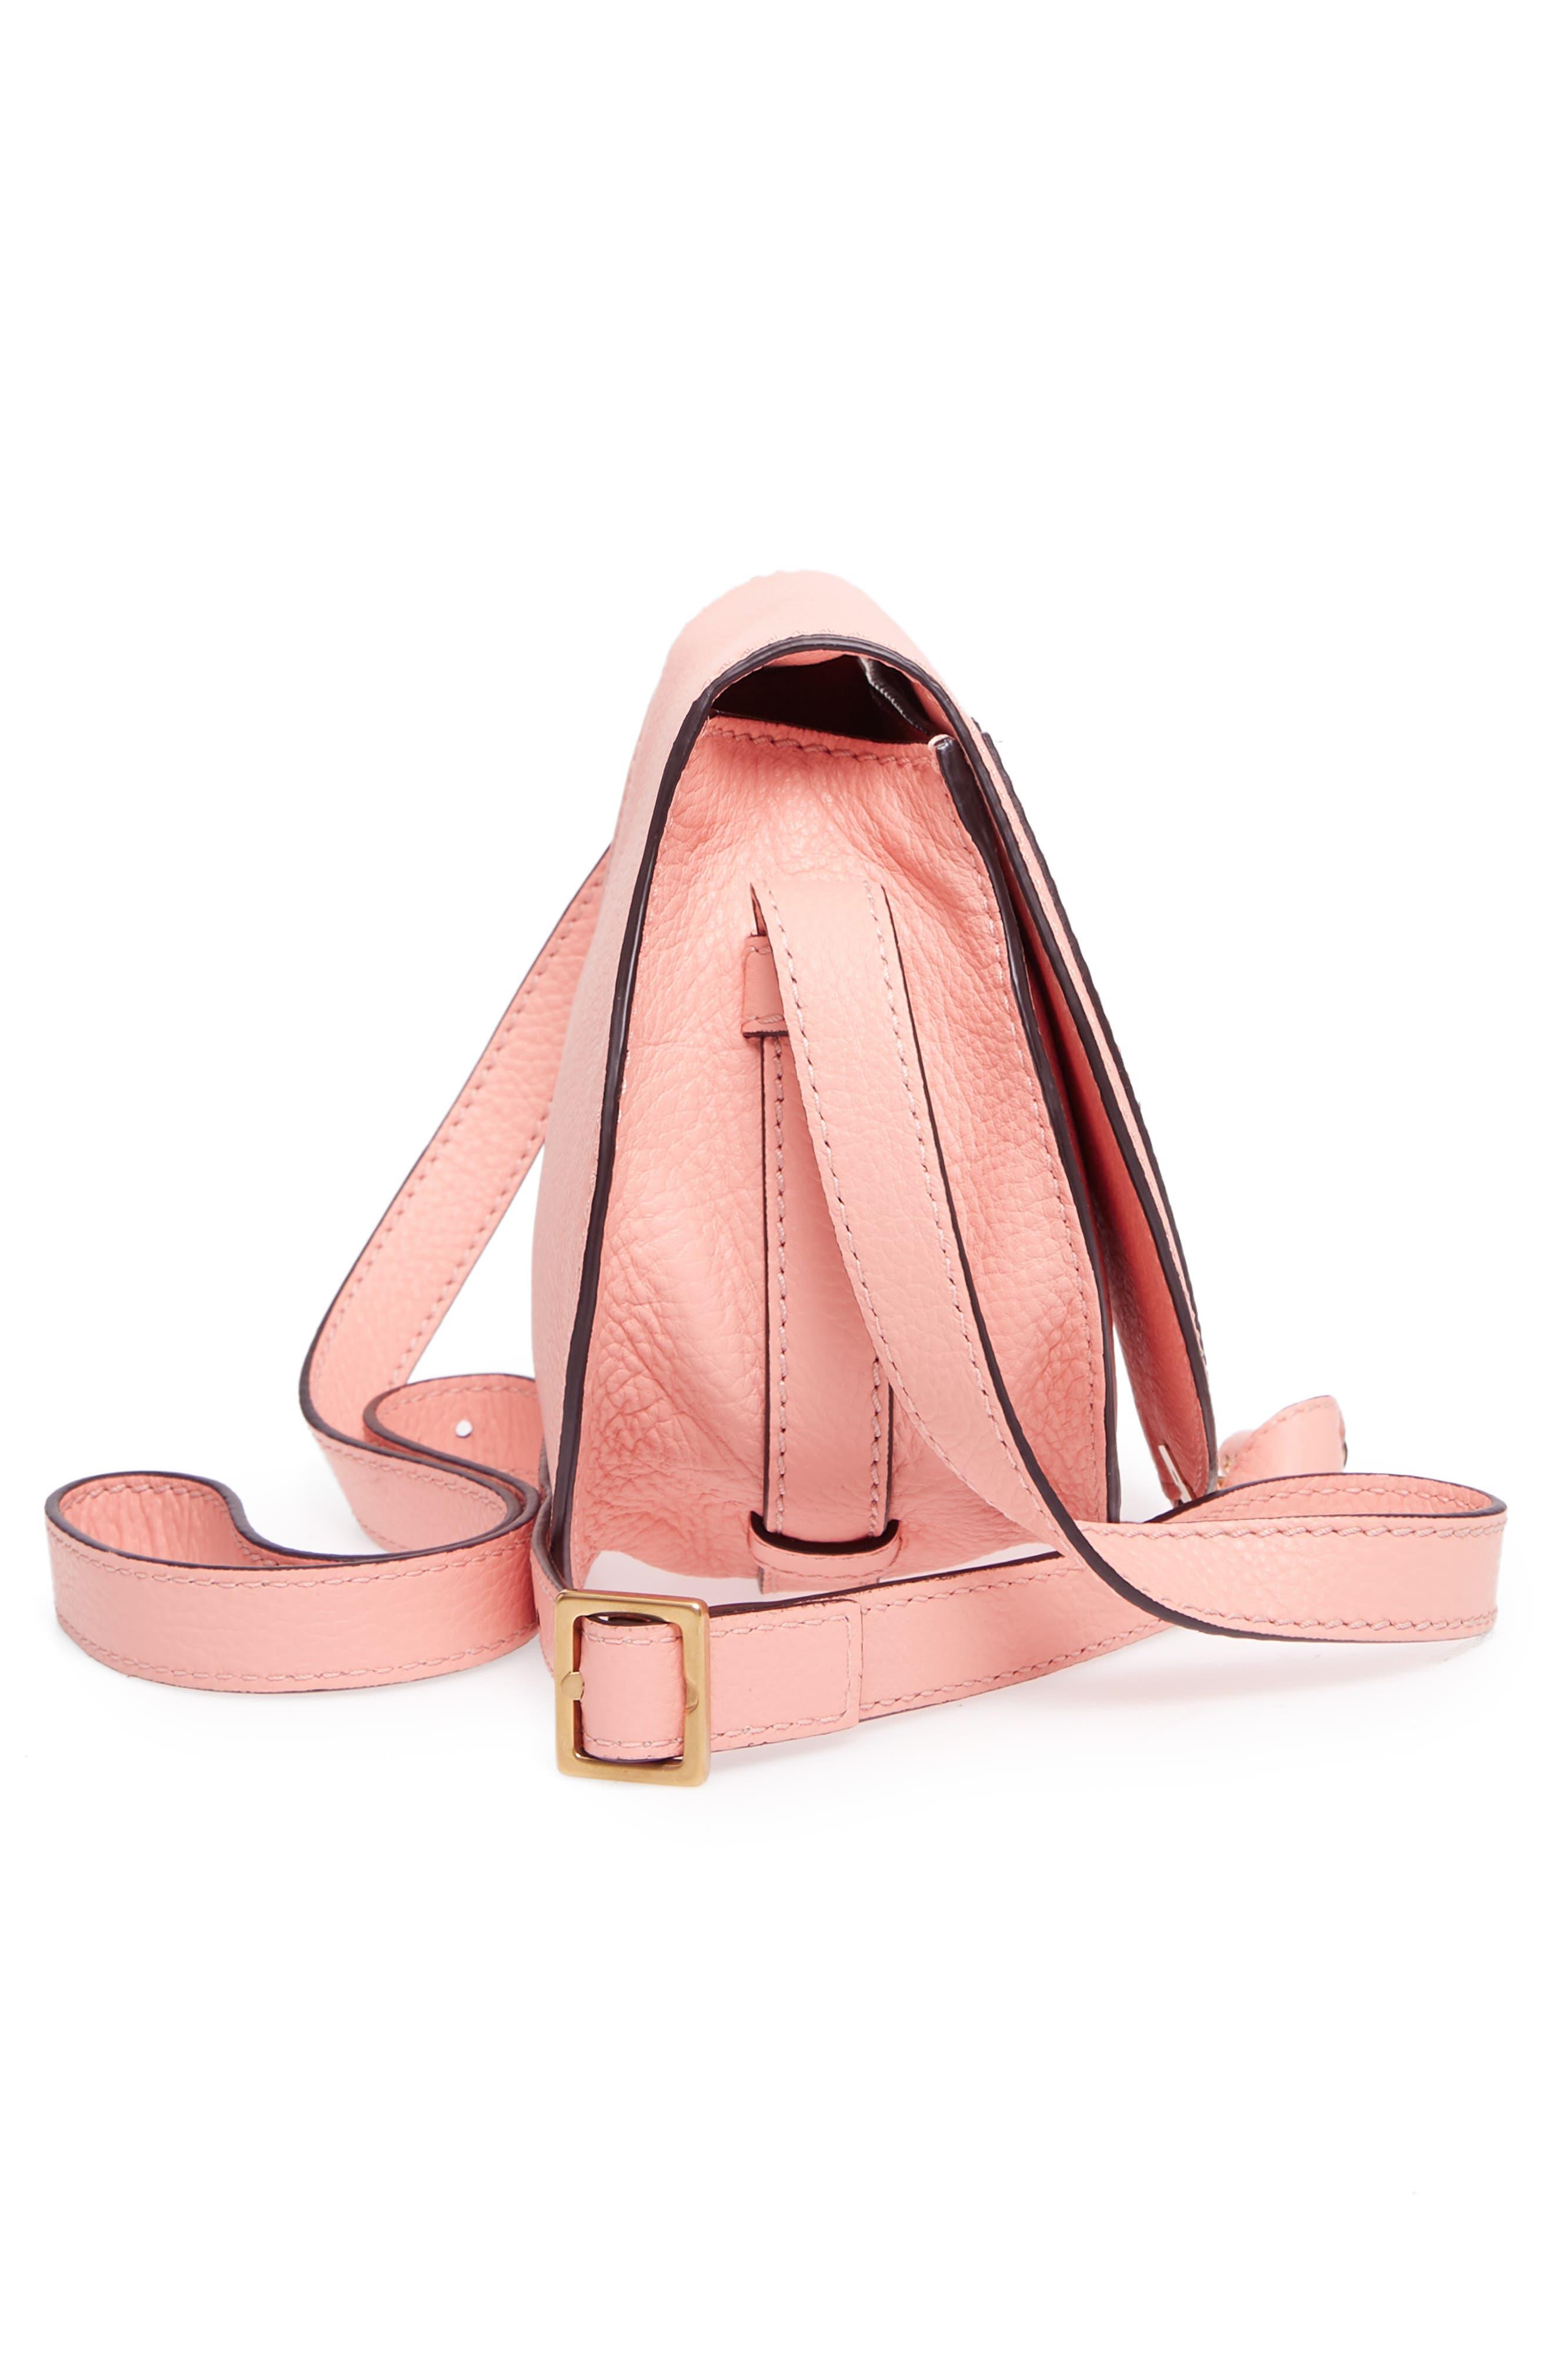 'Mini Marcie' Leather Crossbody Bag,                             Alternate thumbnail 5, color,                             Ideal Blush